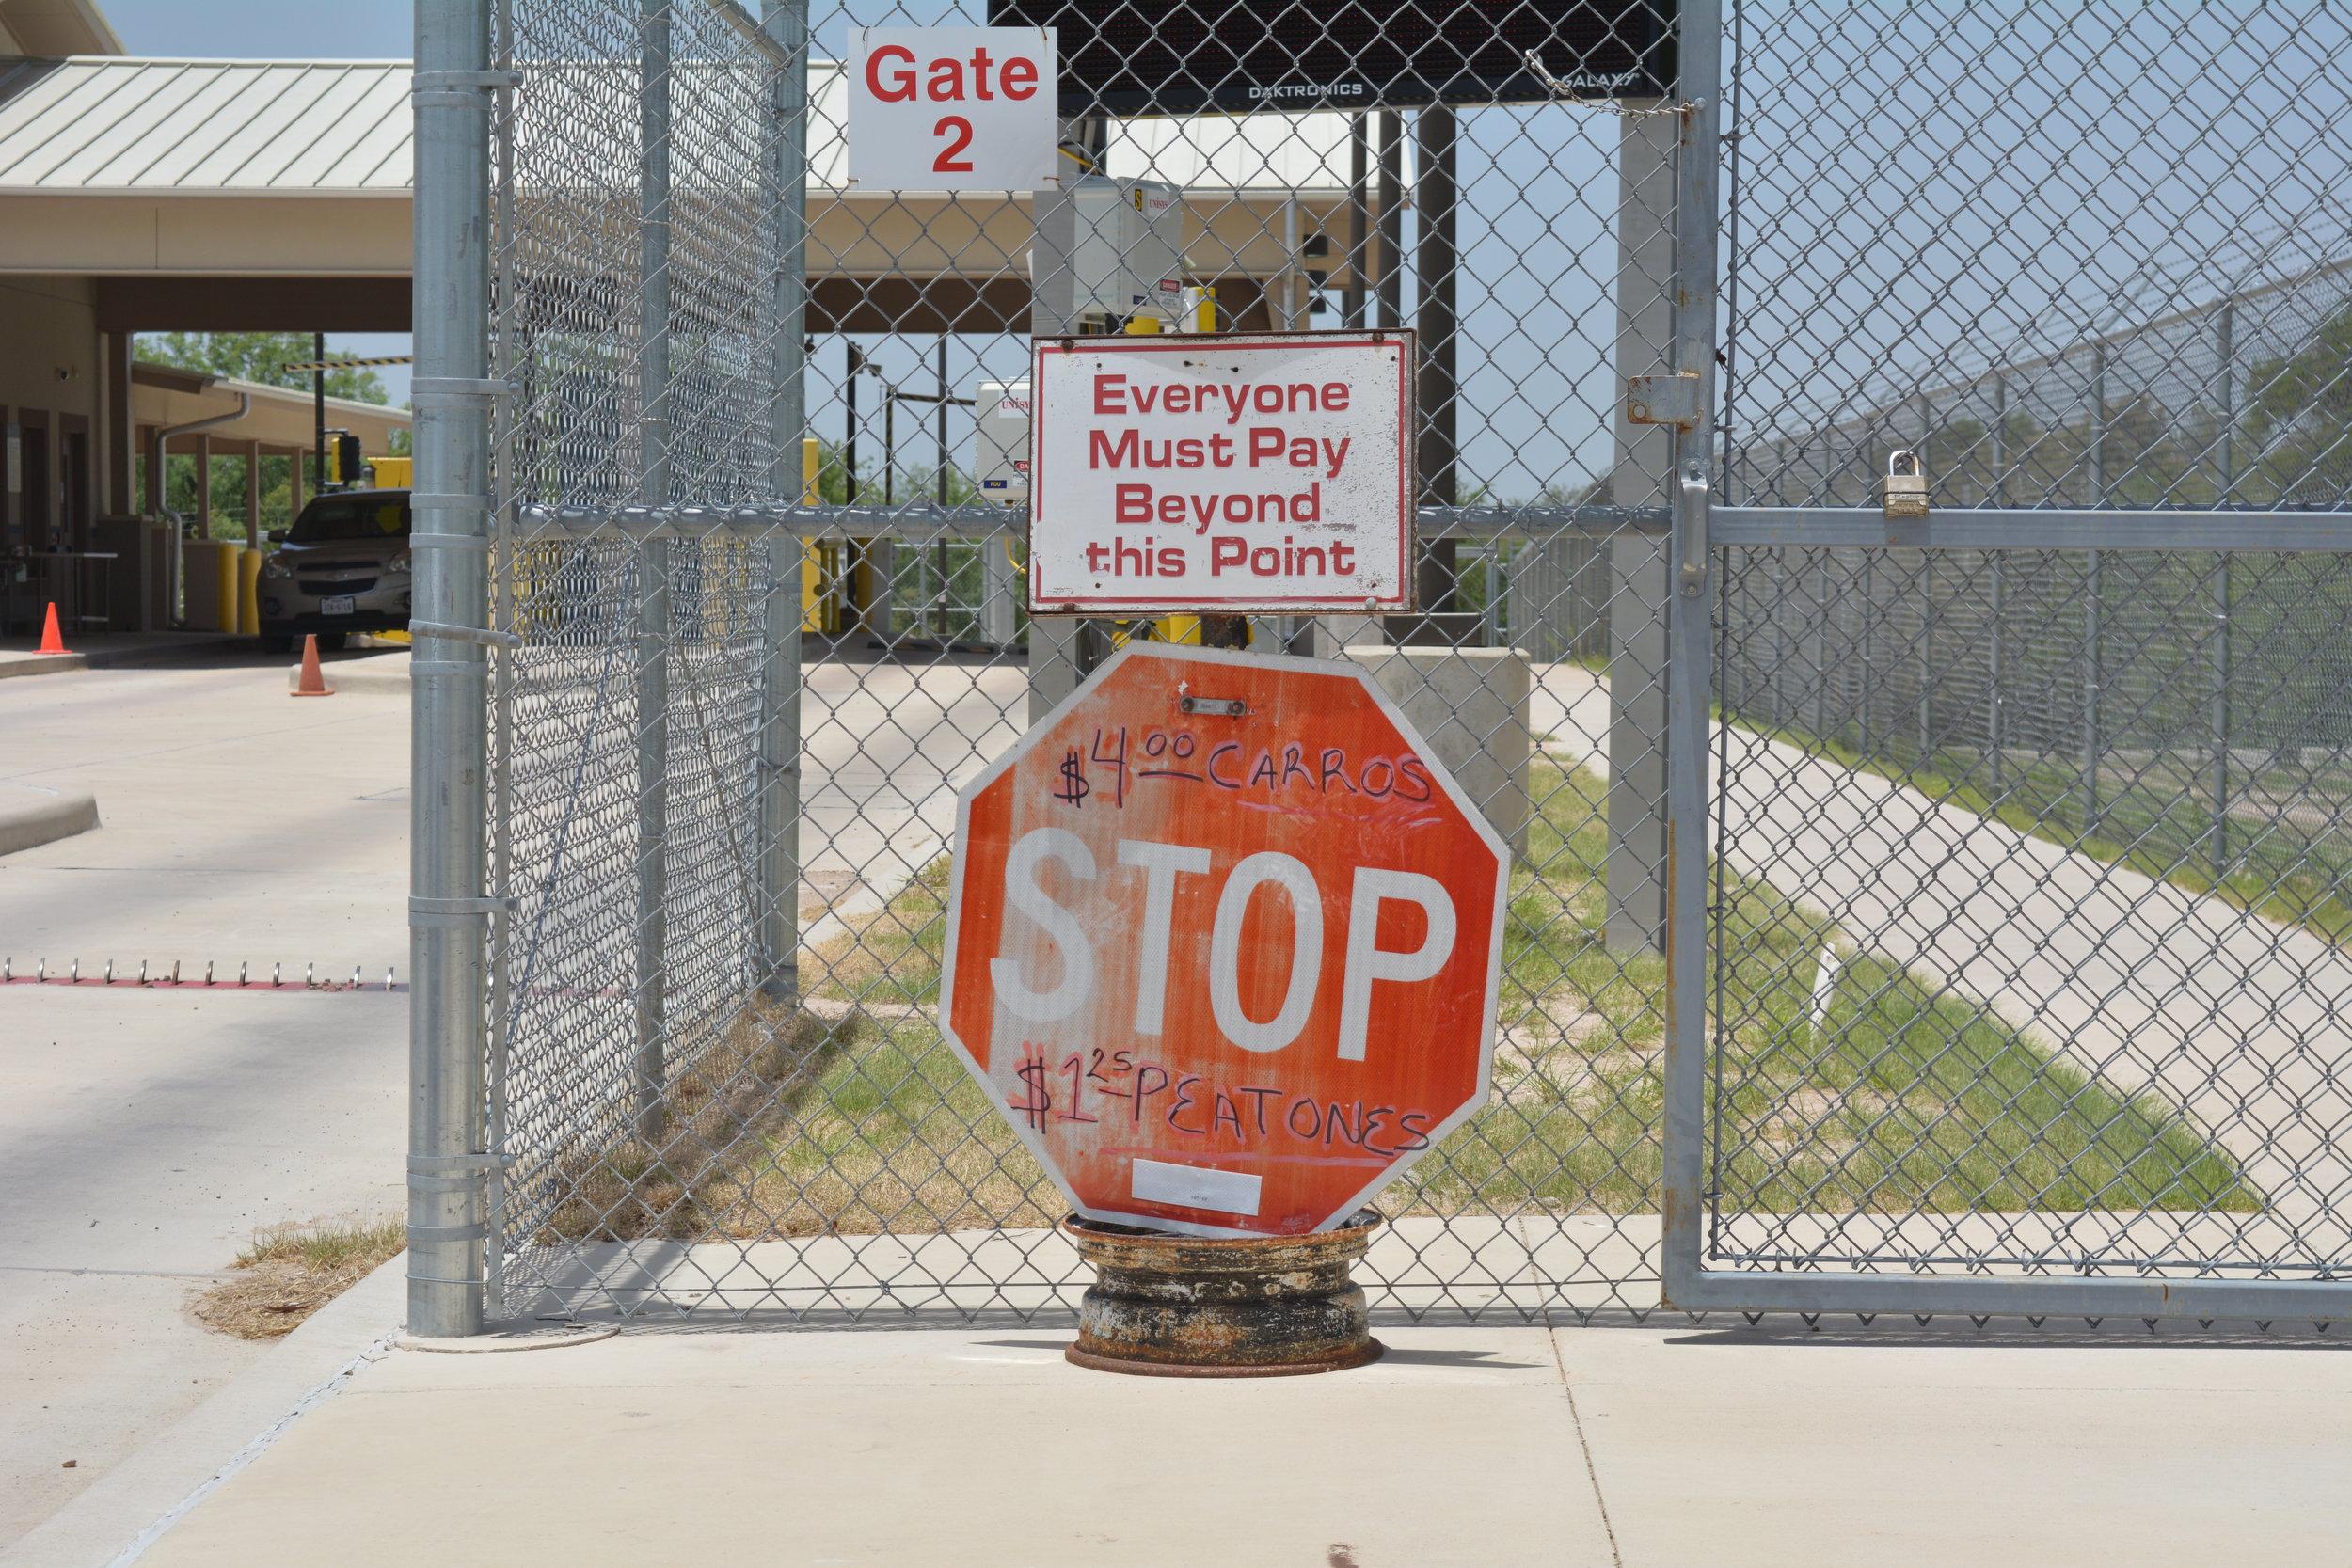 LOS EBANOS PORT OF ENTRY. PHOTO BY SYDNEY BARNETT.